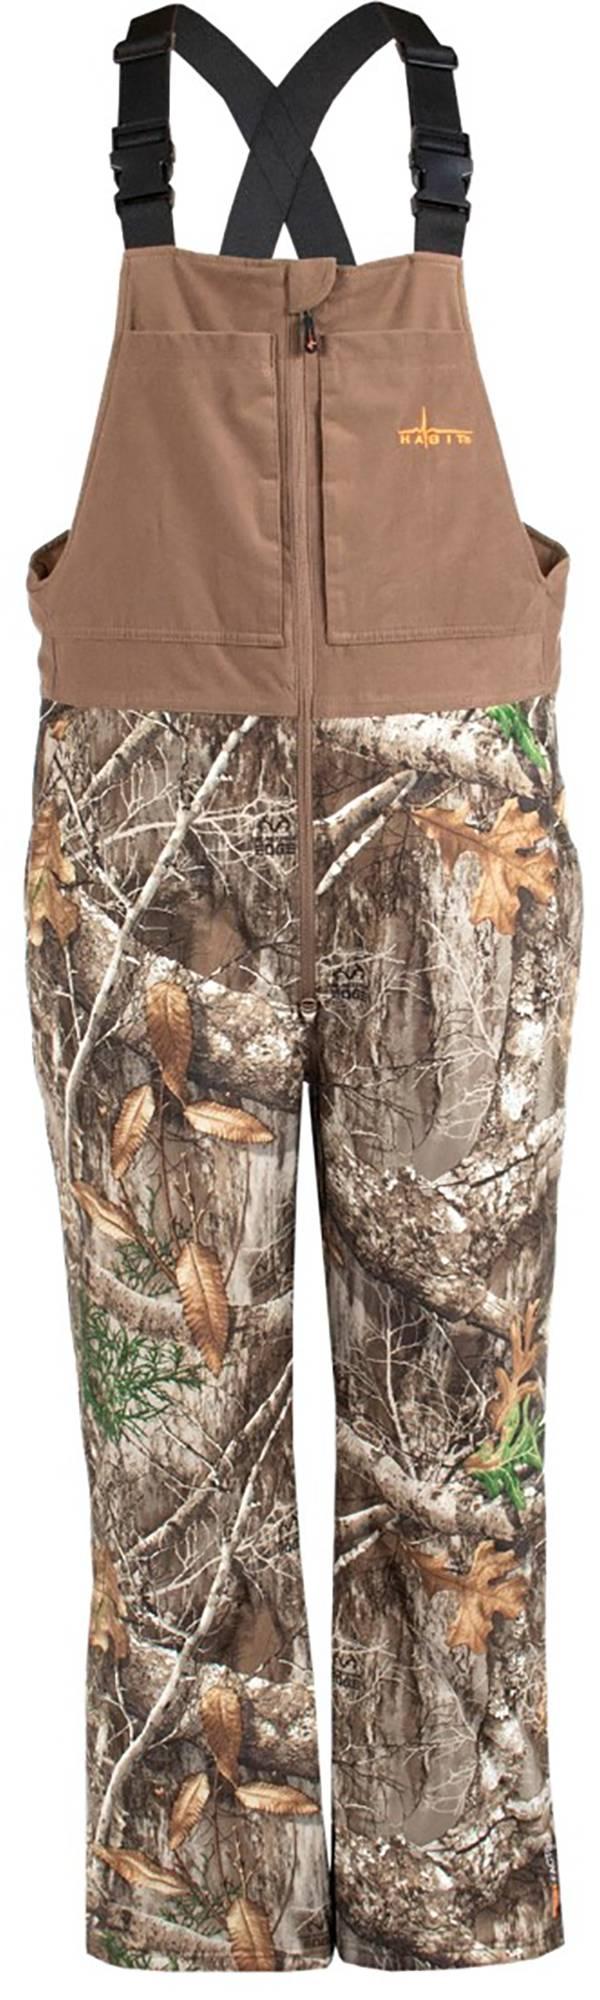 Habit Men's Cedar Branch Insulated Waterproof Hunting Bib product image